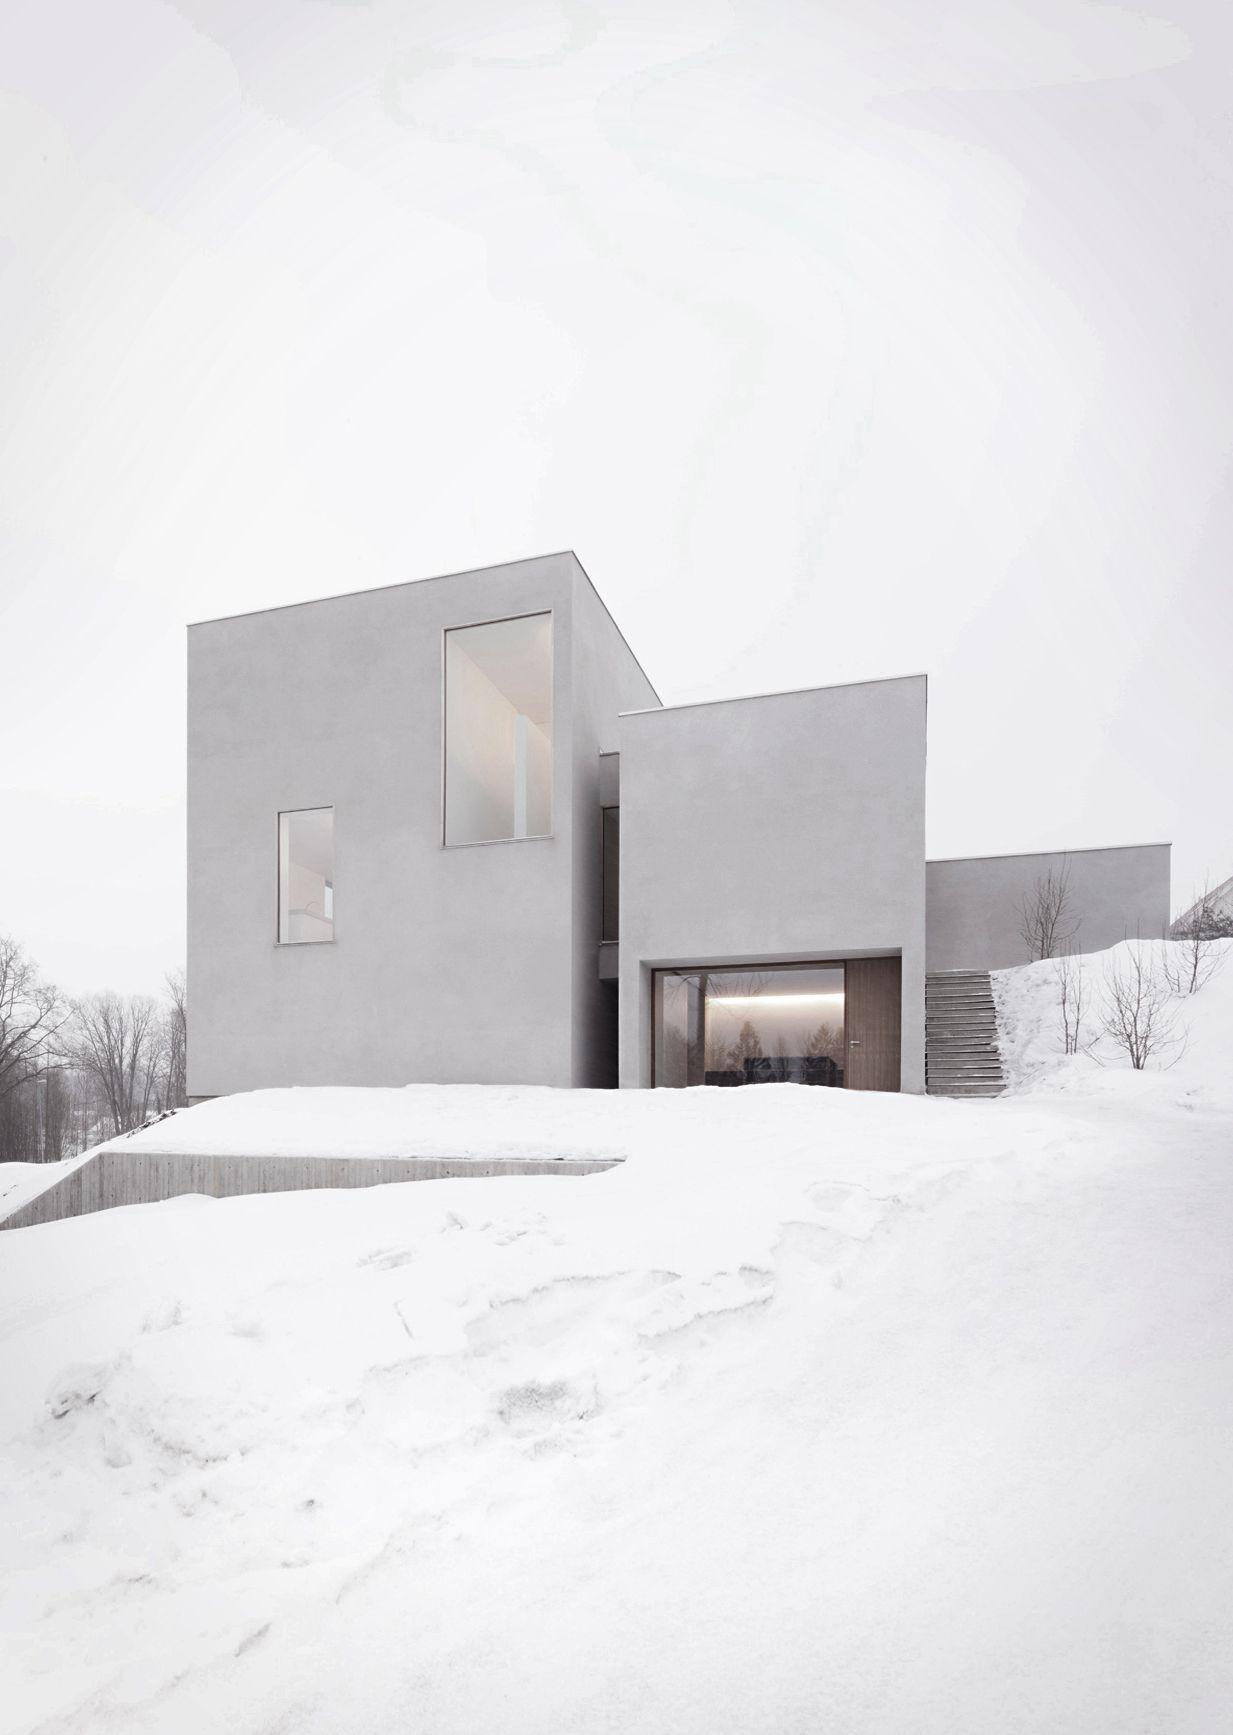 Einfaches hausdesign hd scarflove  great outdoors  pinterest  architektur